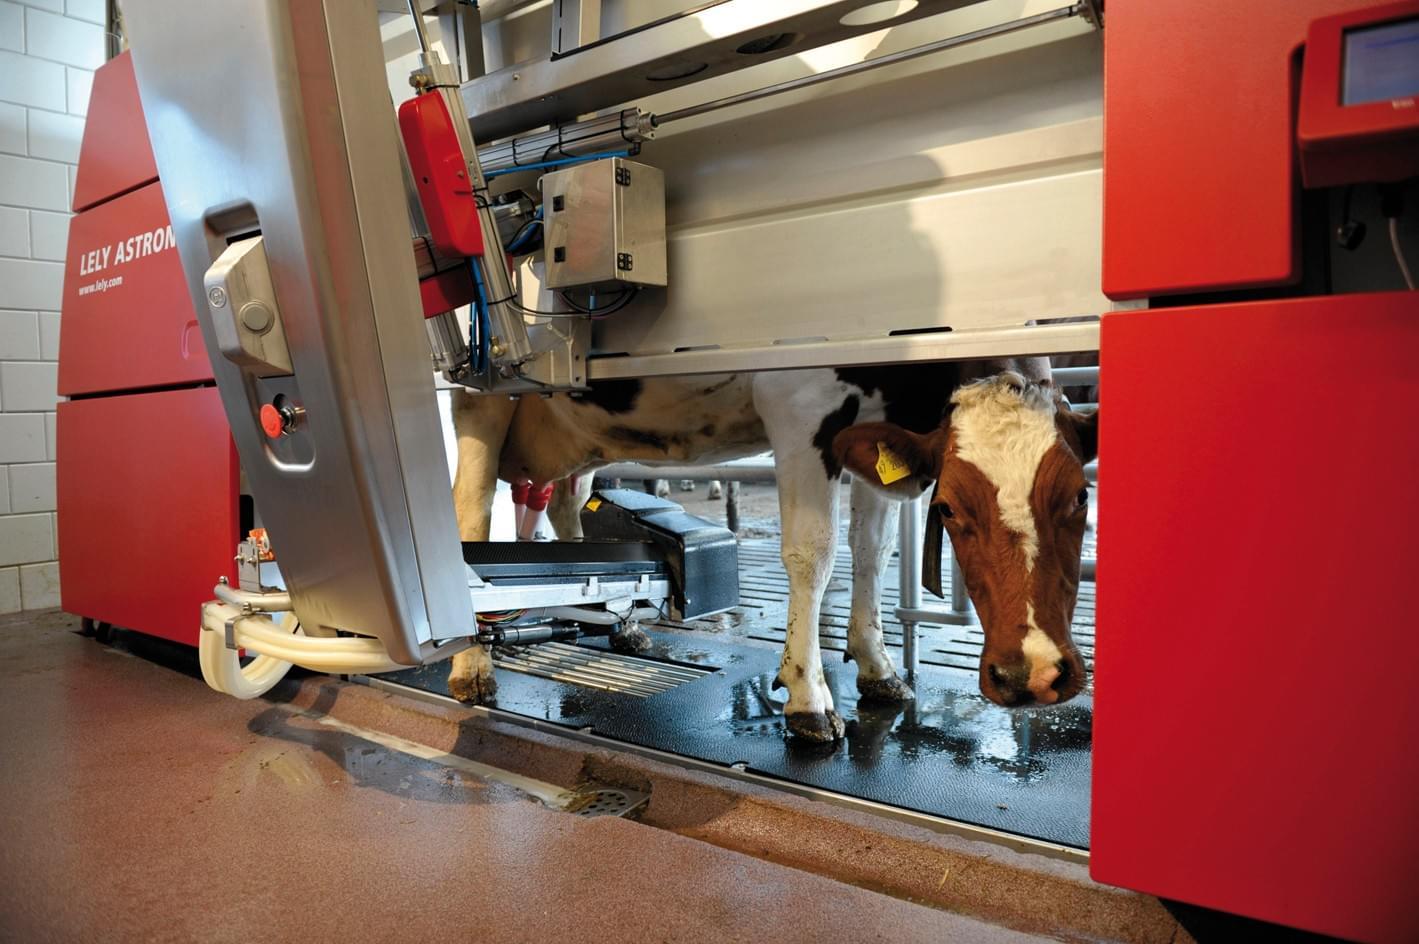 Roboti de muls Lely Astronaut A4